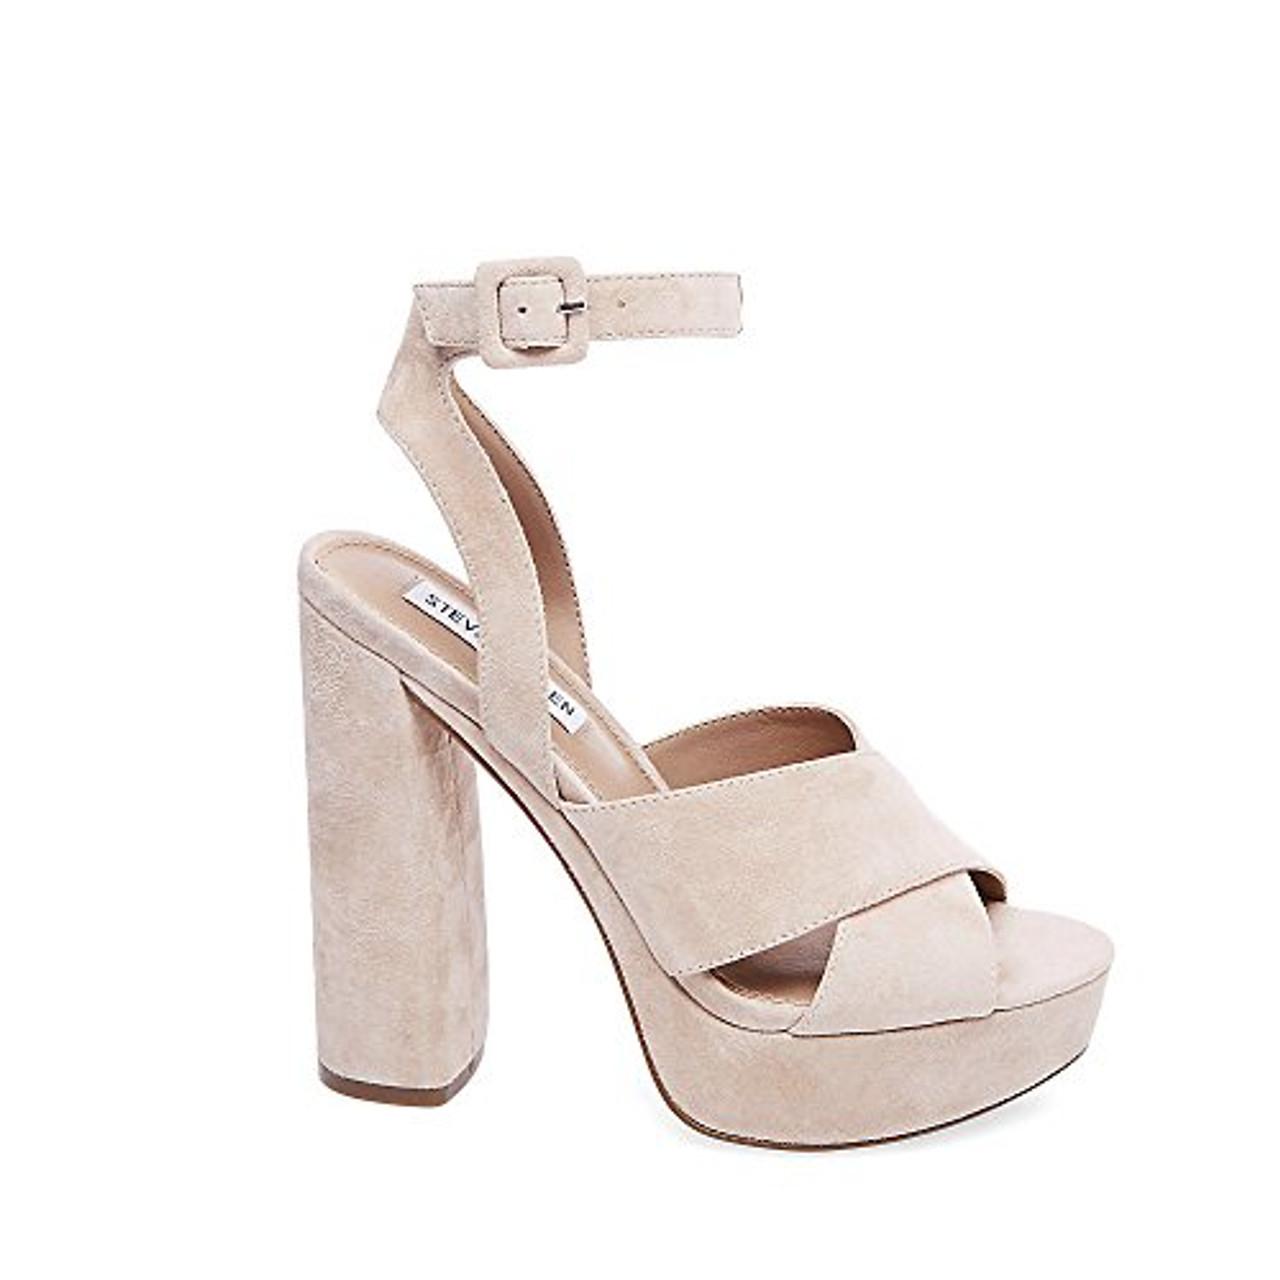 6ad7b5e22a2e3 ... Steve Madden Womens Jodi Leather Open Toe Formal Ankle Strap  Sandals~pp-7ce2b359 ...